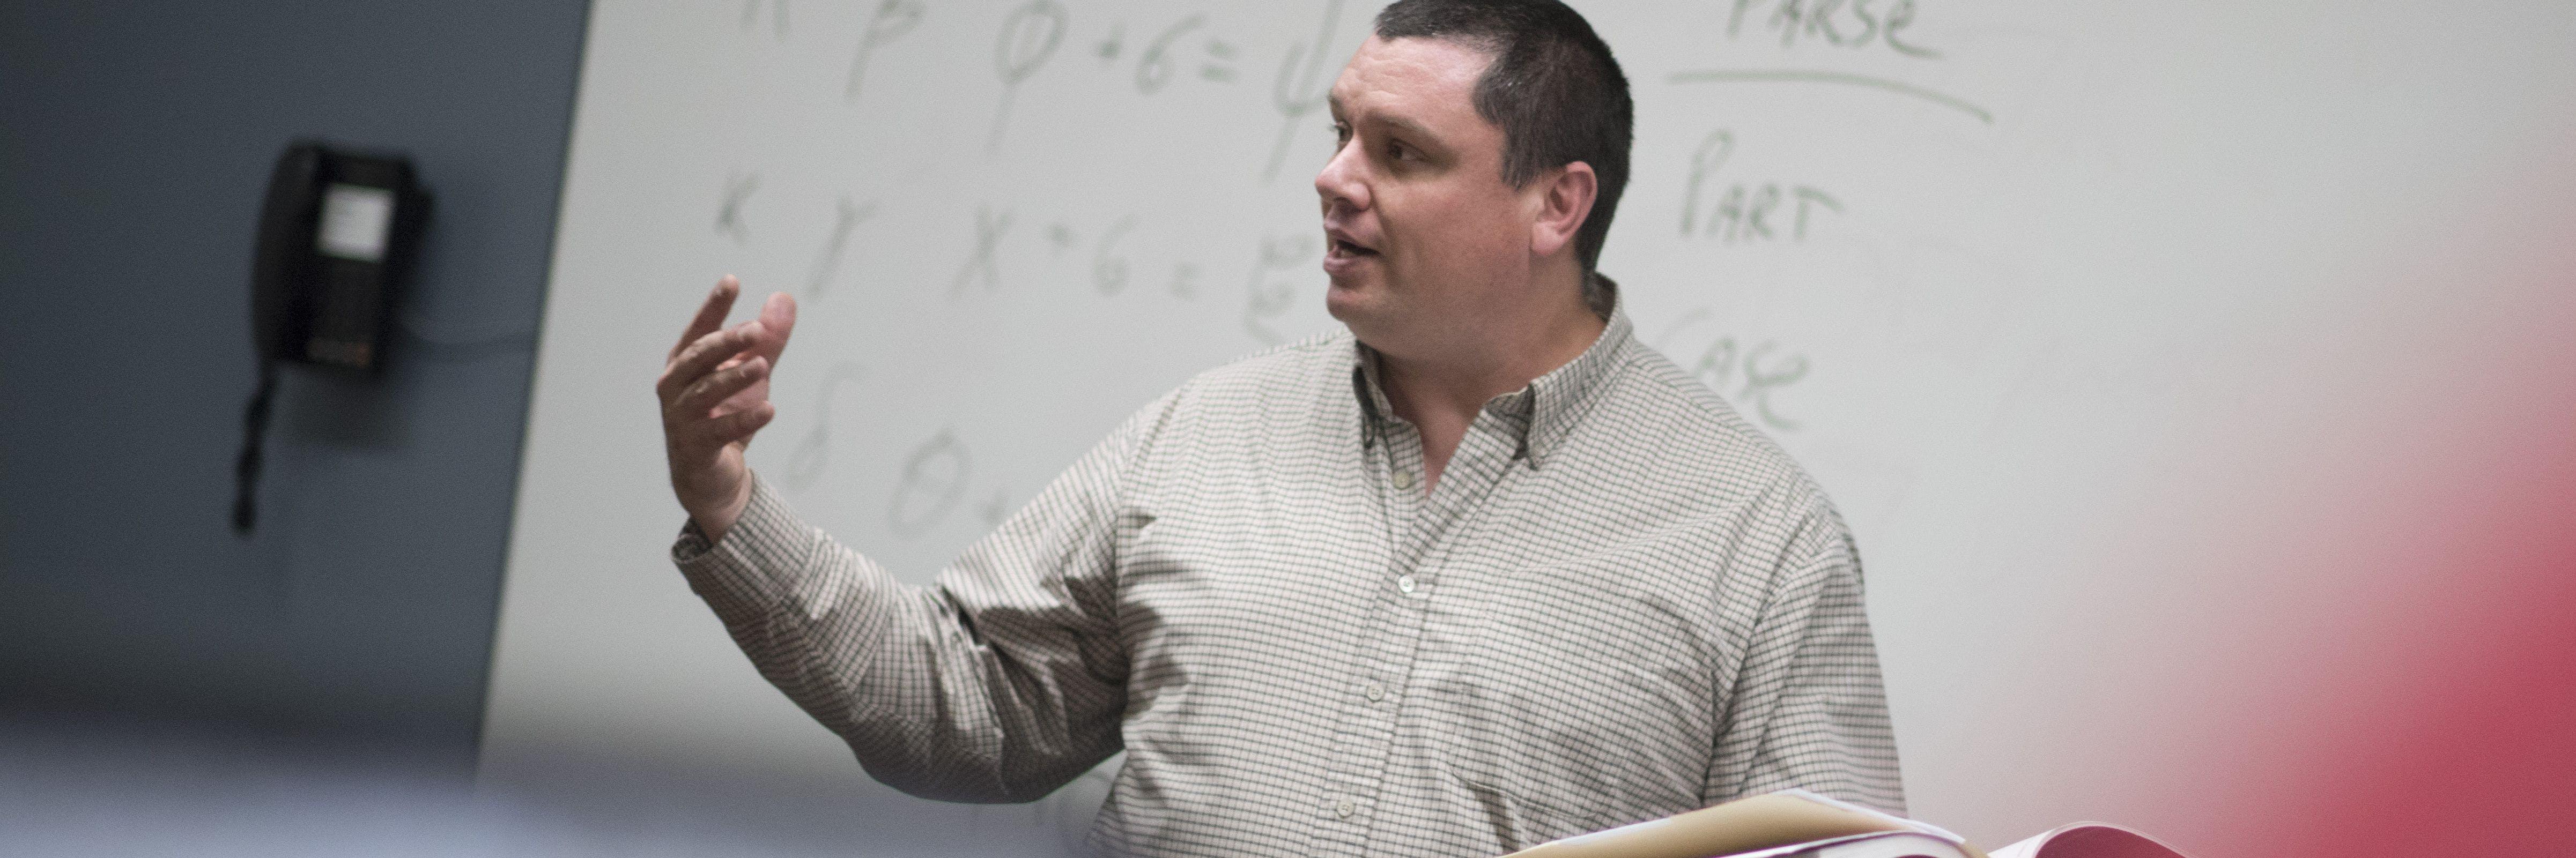 Seminary professor teaching in the classroom